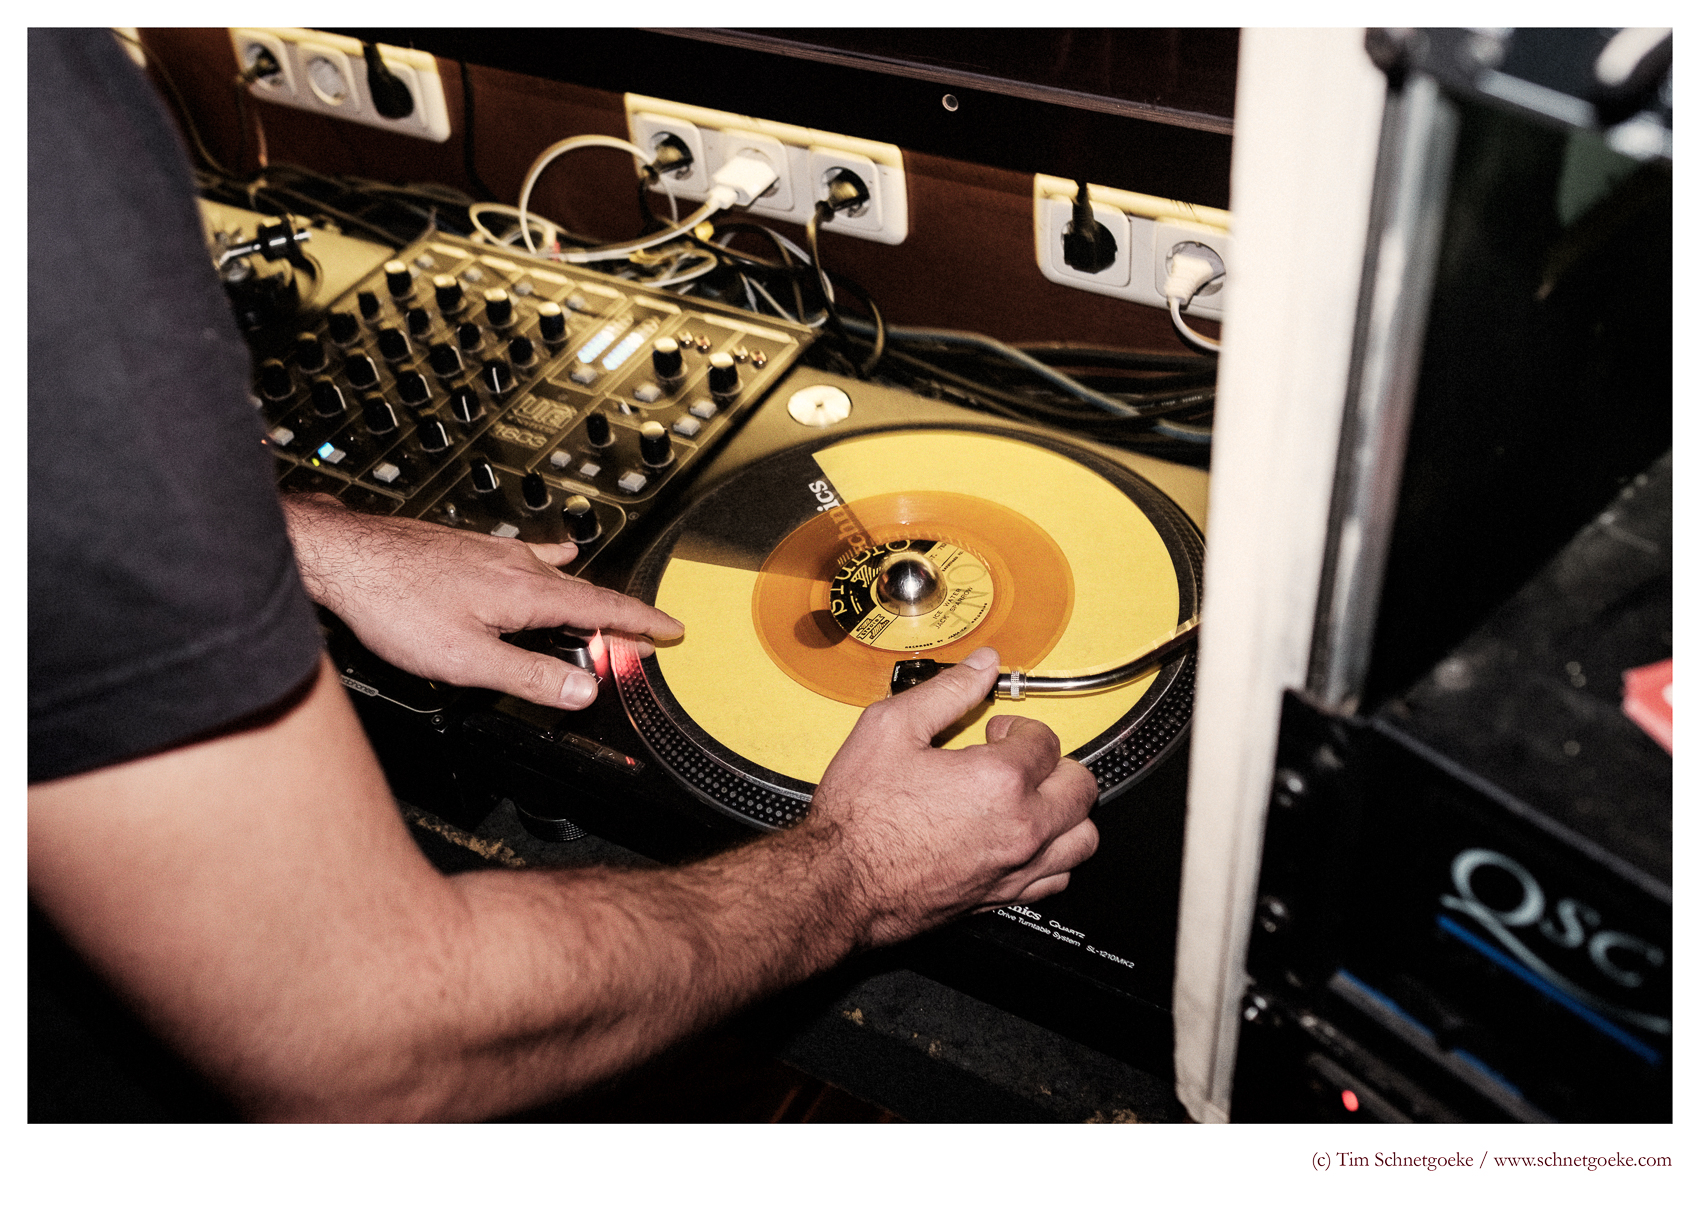 Maratone Soundsystem - Vinyl Record